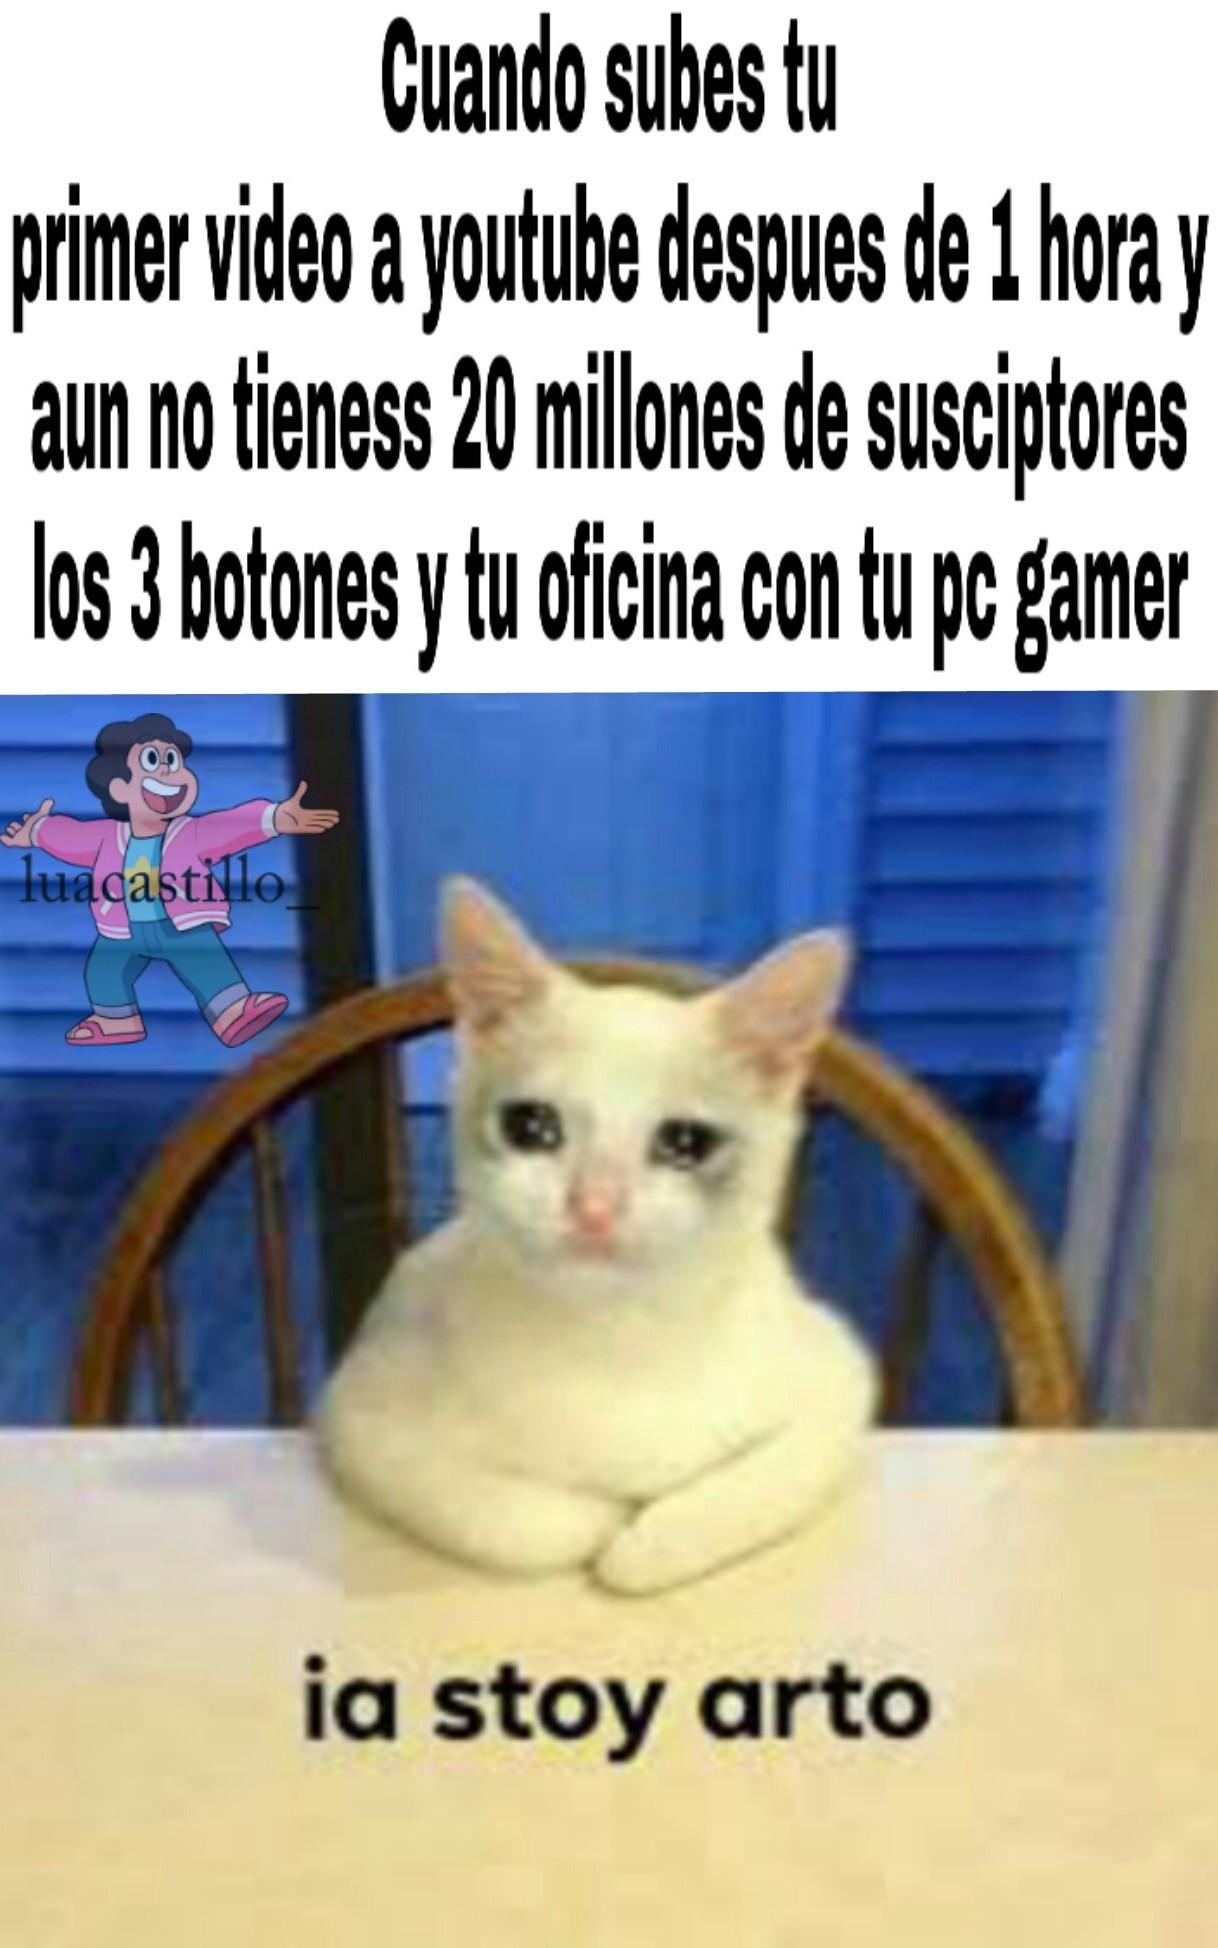 Stoi arto - meme